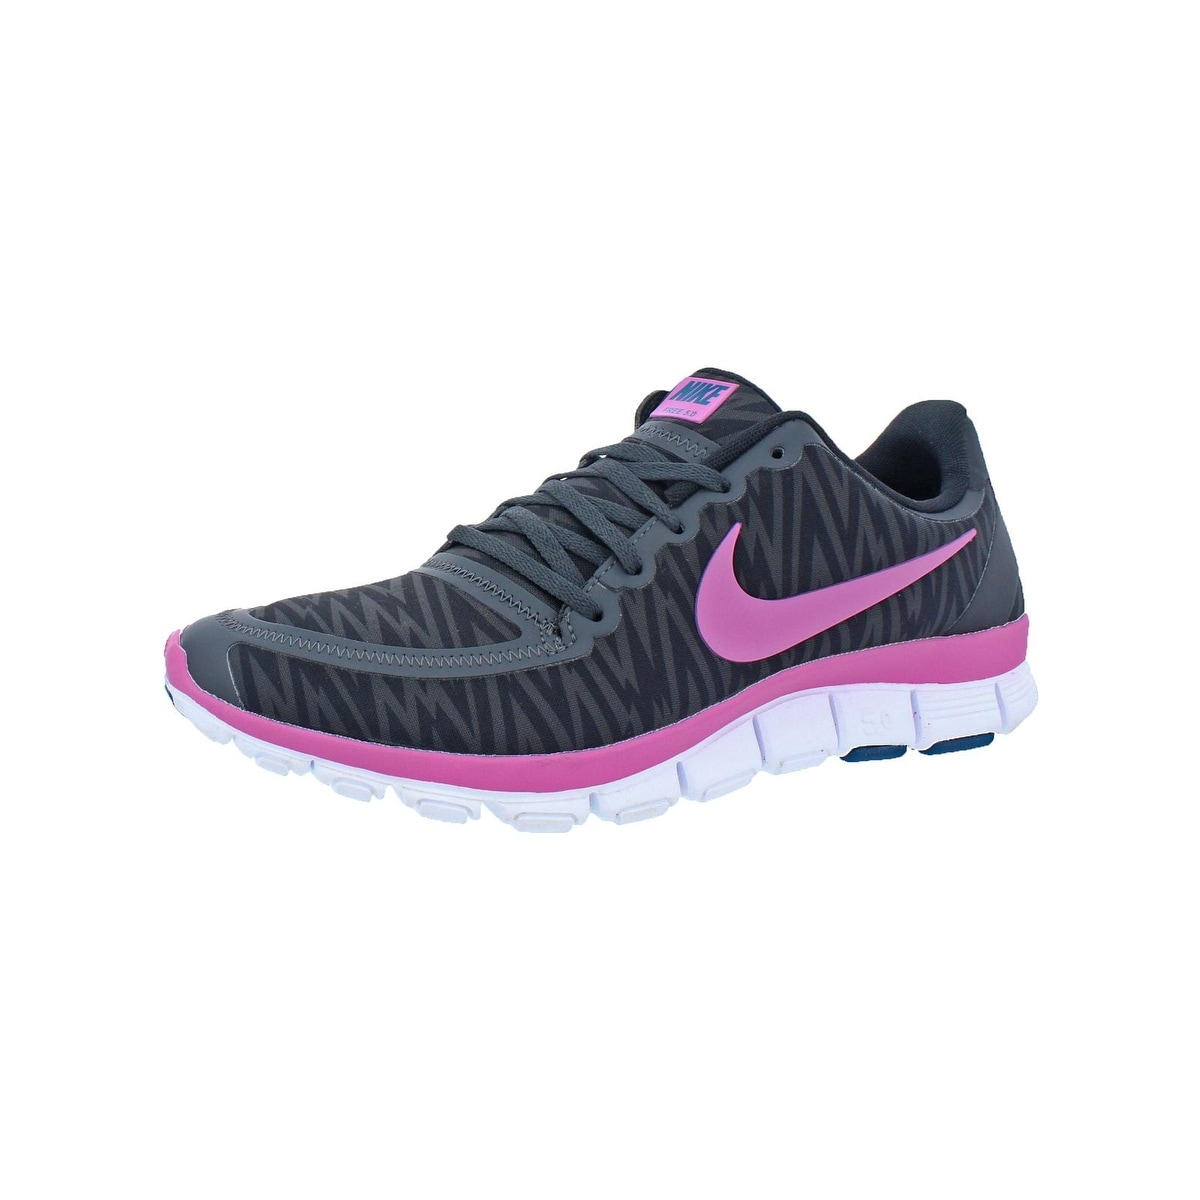 super popular 2a165 412d9 Nike Womens Free 5.0 V4 Running Shoes Training Flexible